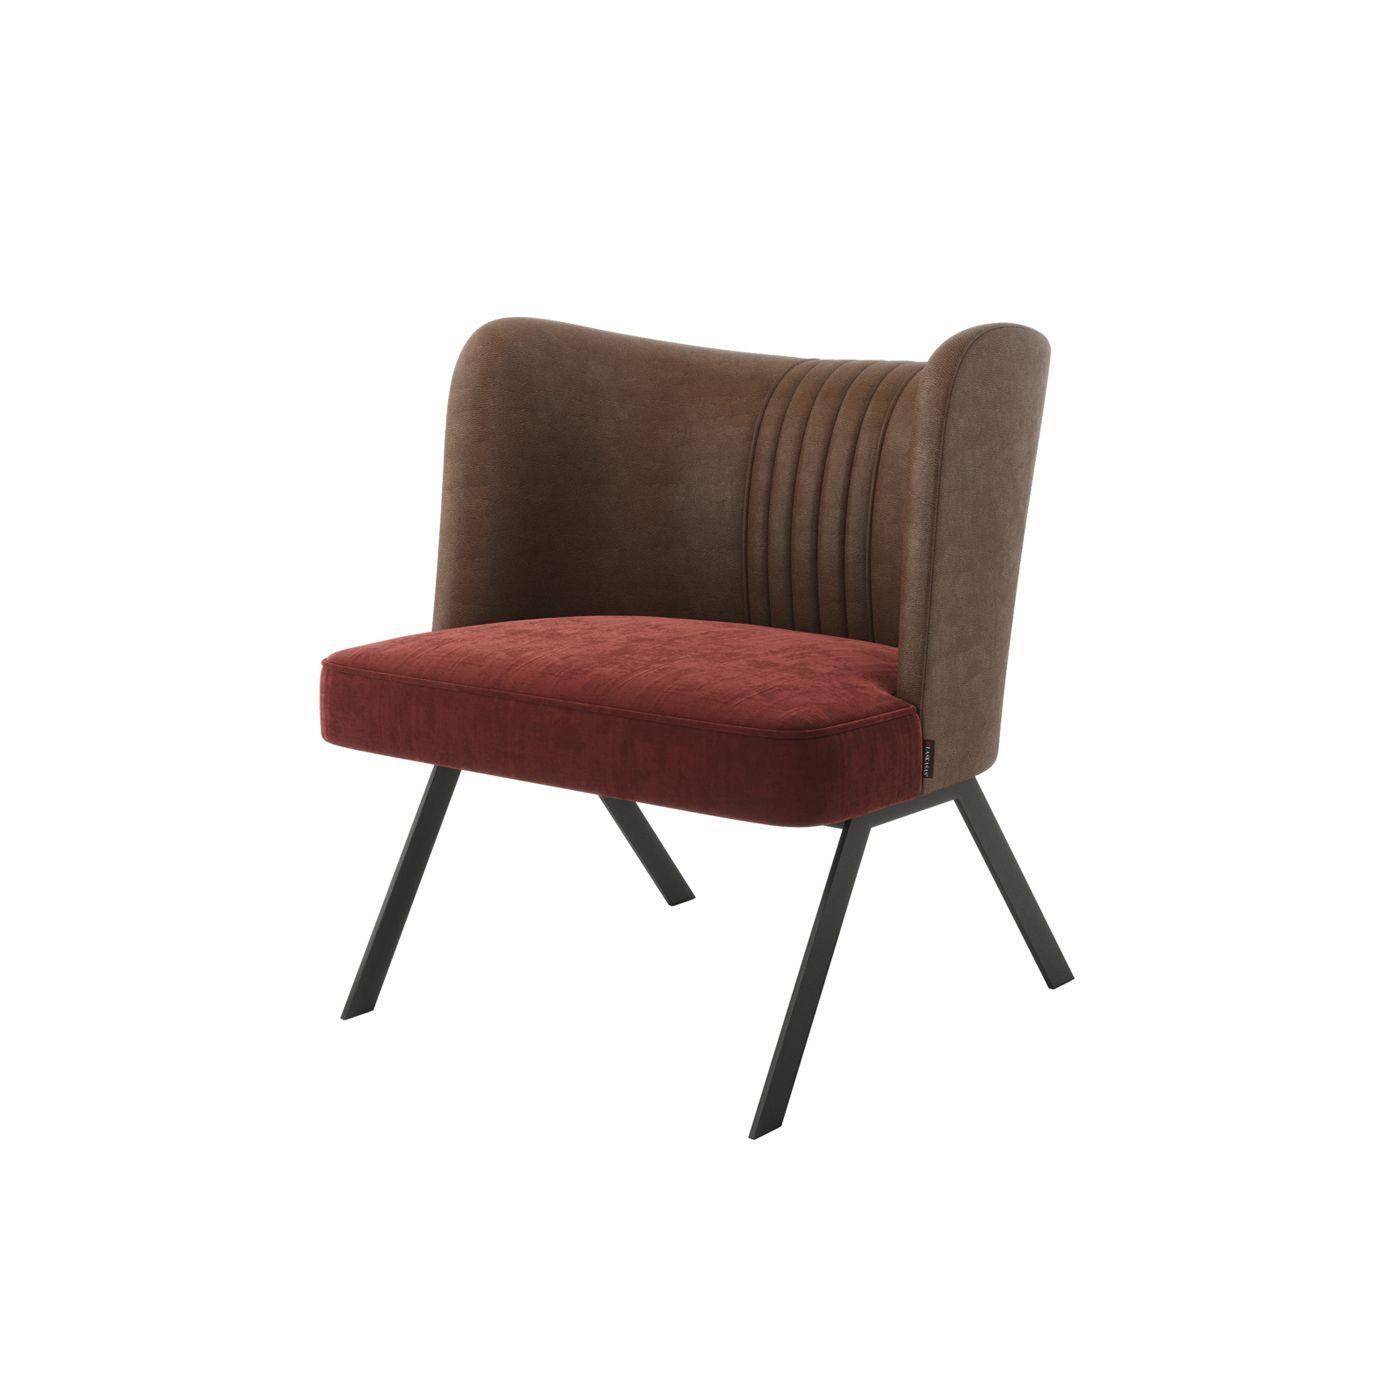 Gordon Armchair - Living Room Decor - Laskasas | Decorate your Life ...